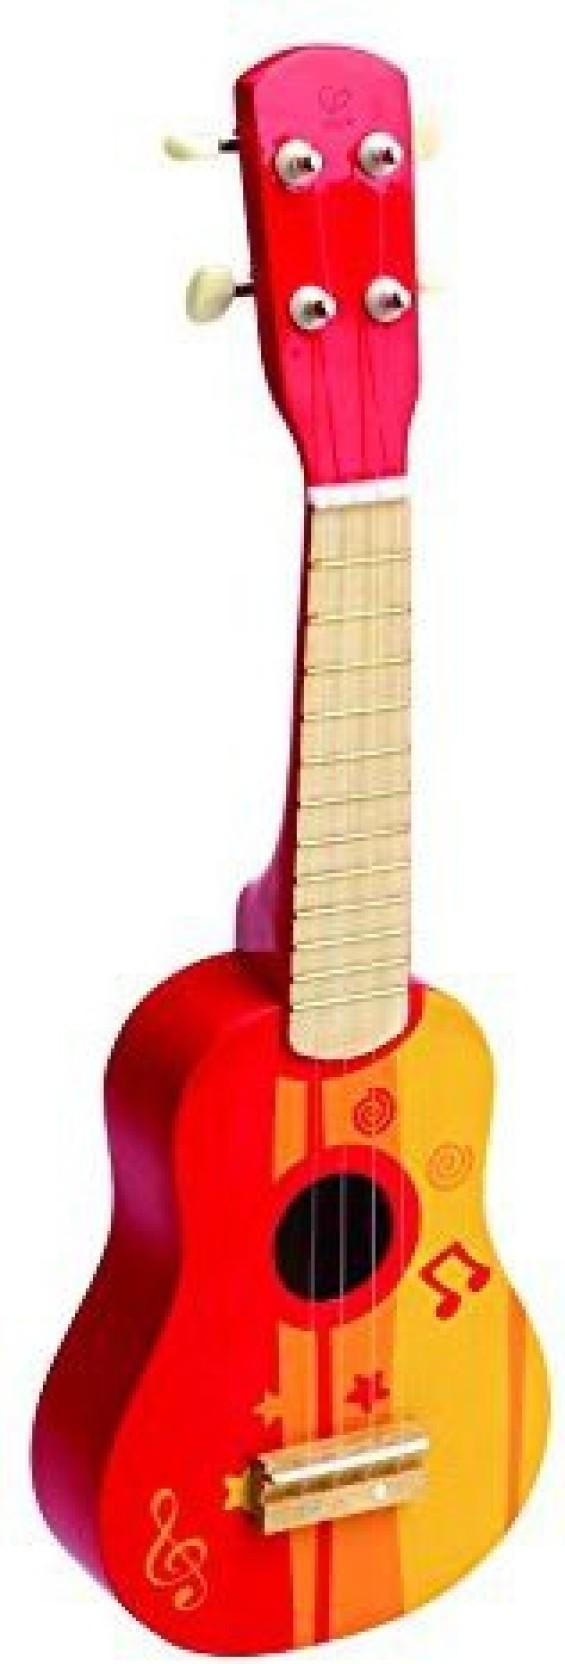 hape kid's wooden toy ukulele in red - kid's wooden toy